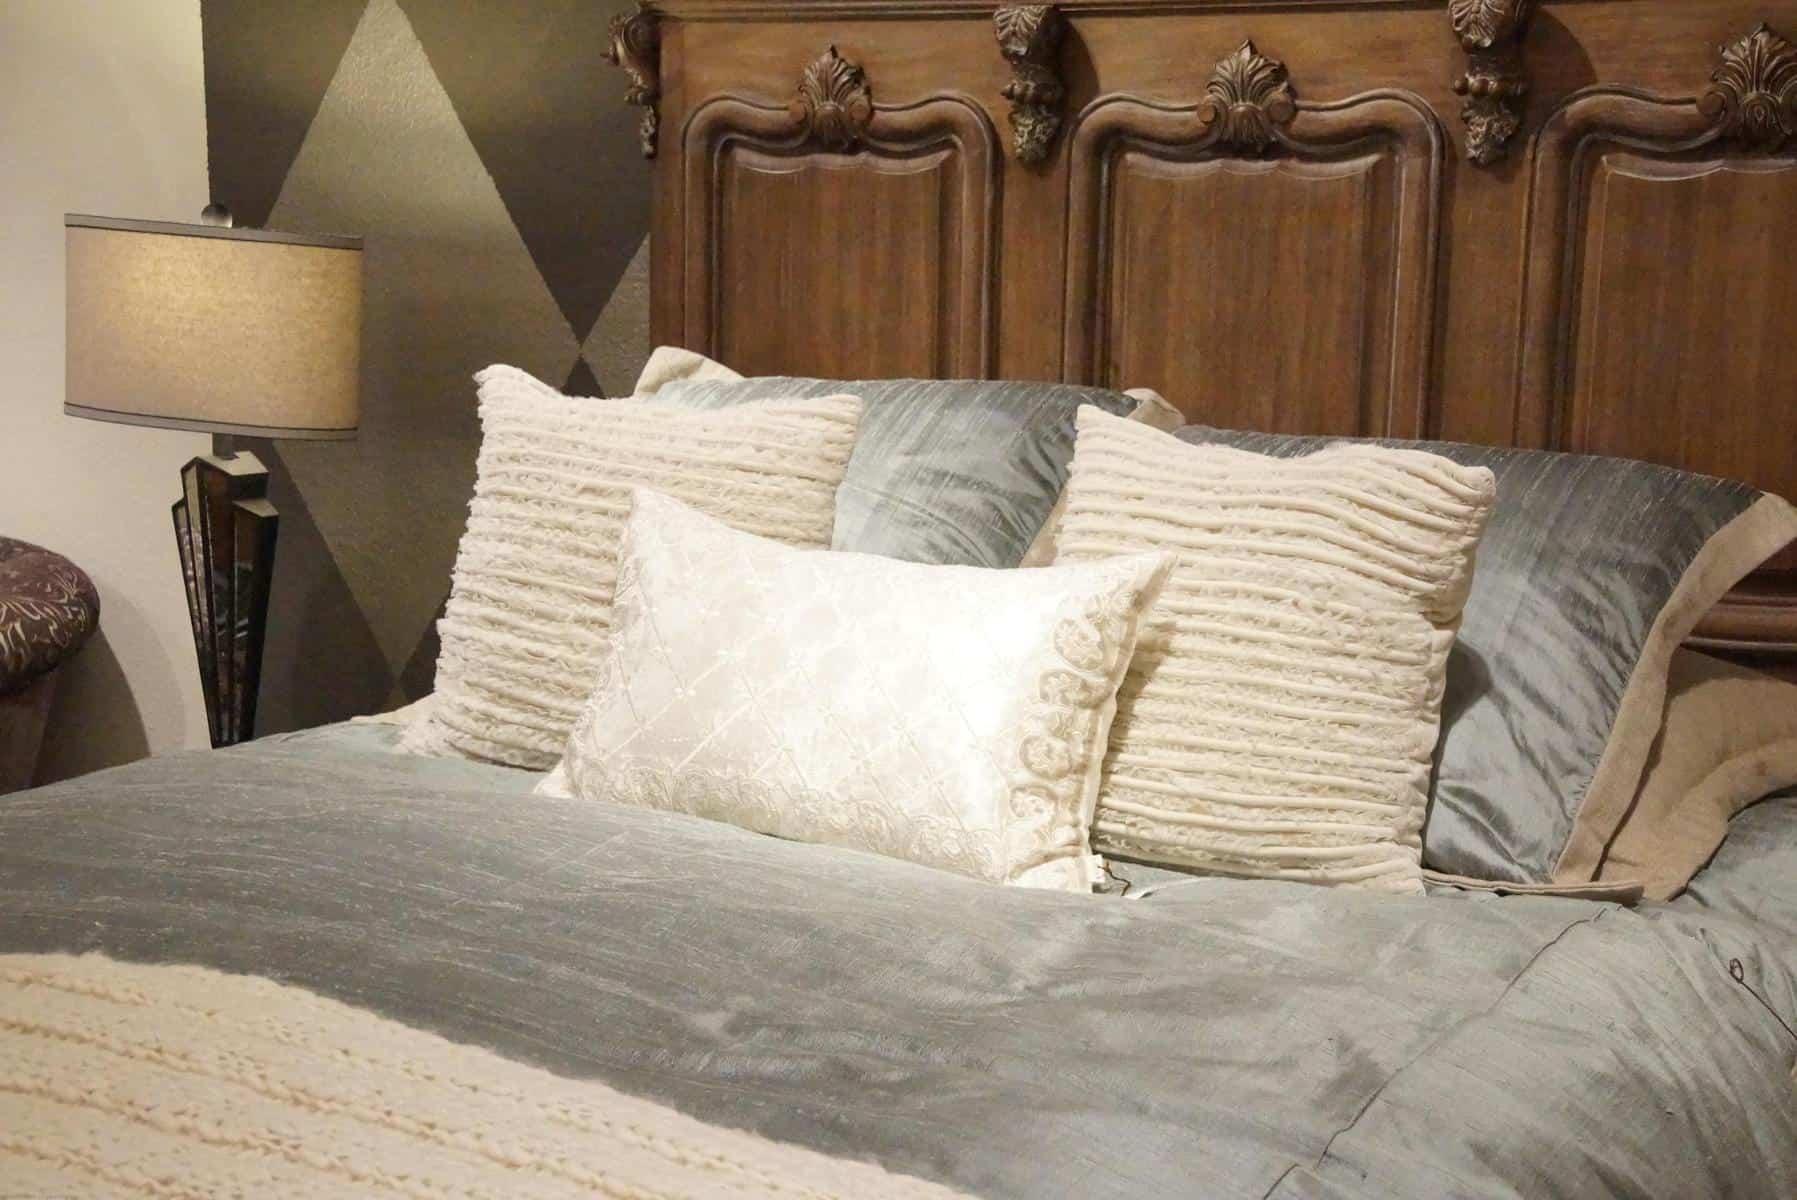 Arhaus Furniture: Favorite Source For Home Decor